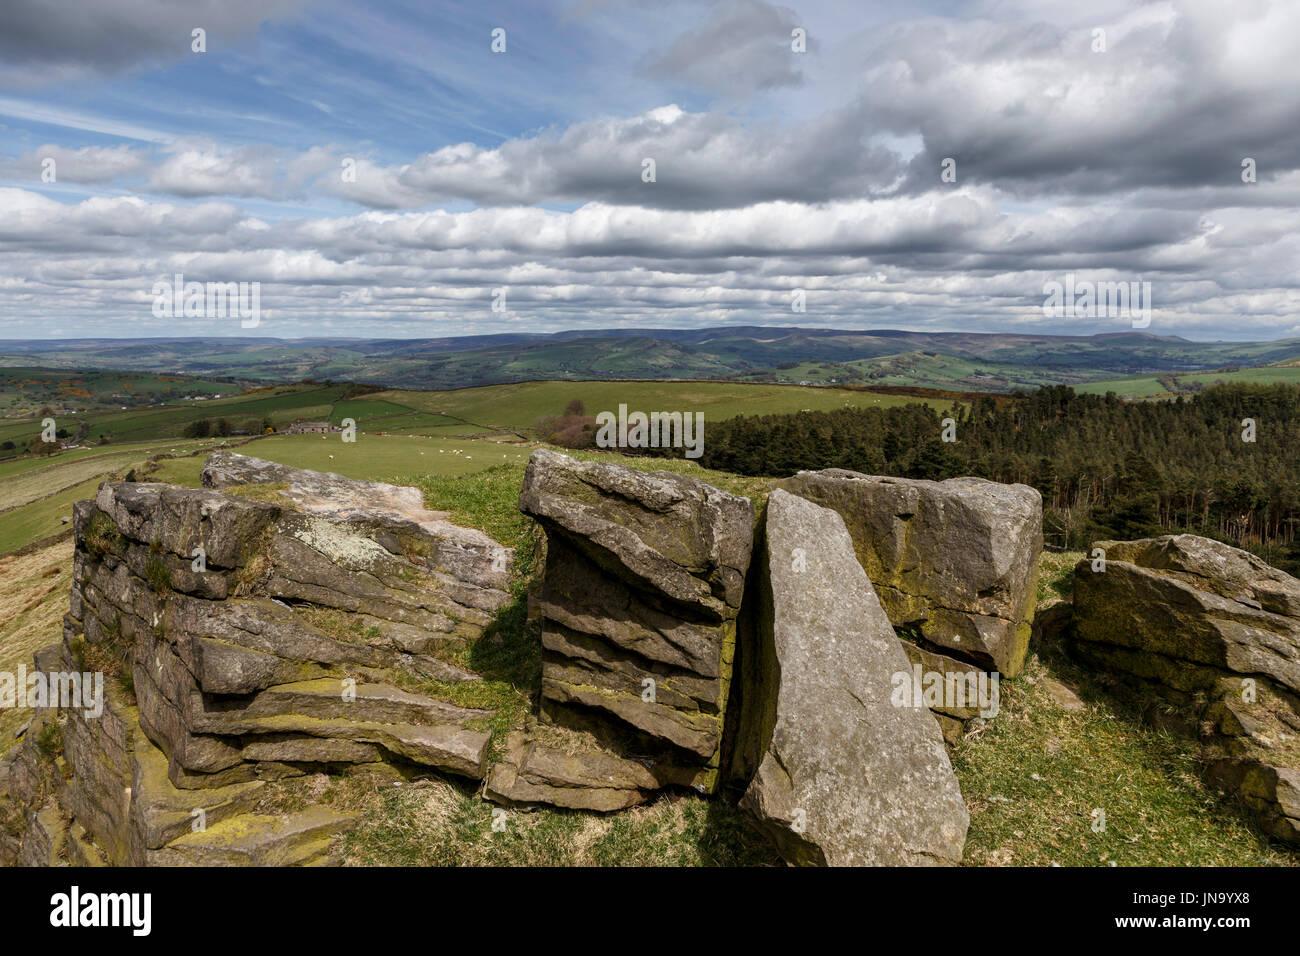 windgather rocks, peak district national park, derbyshire, england, uk, gb - Stock Image